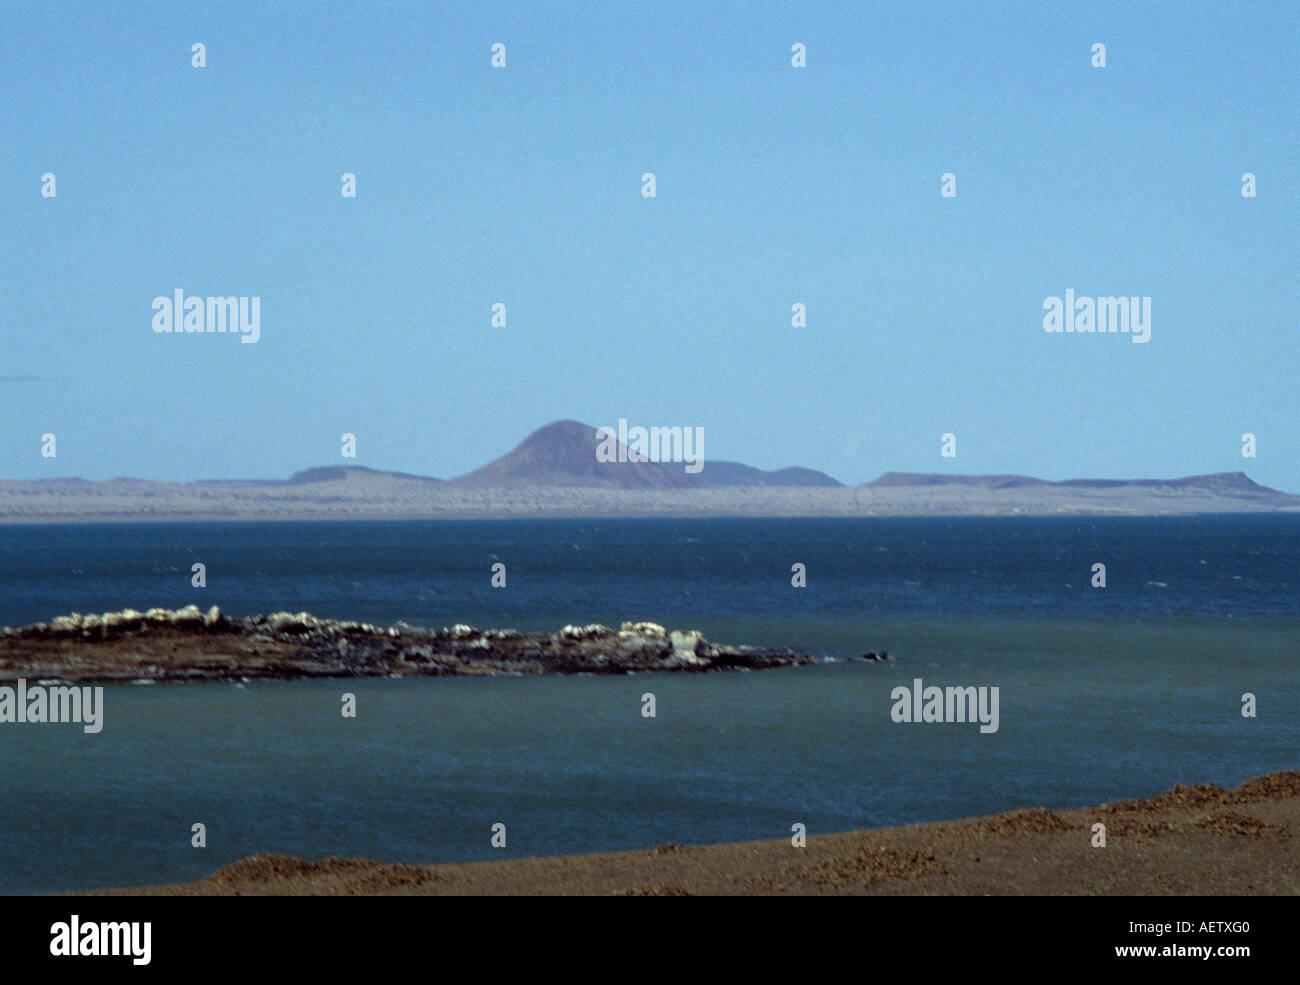 Lake Turkana, northern Kenya East Africa Stock Photo